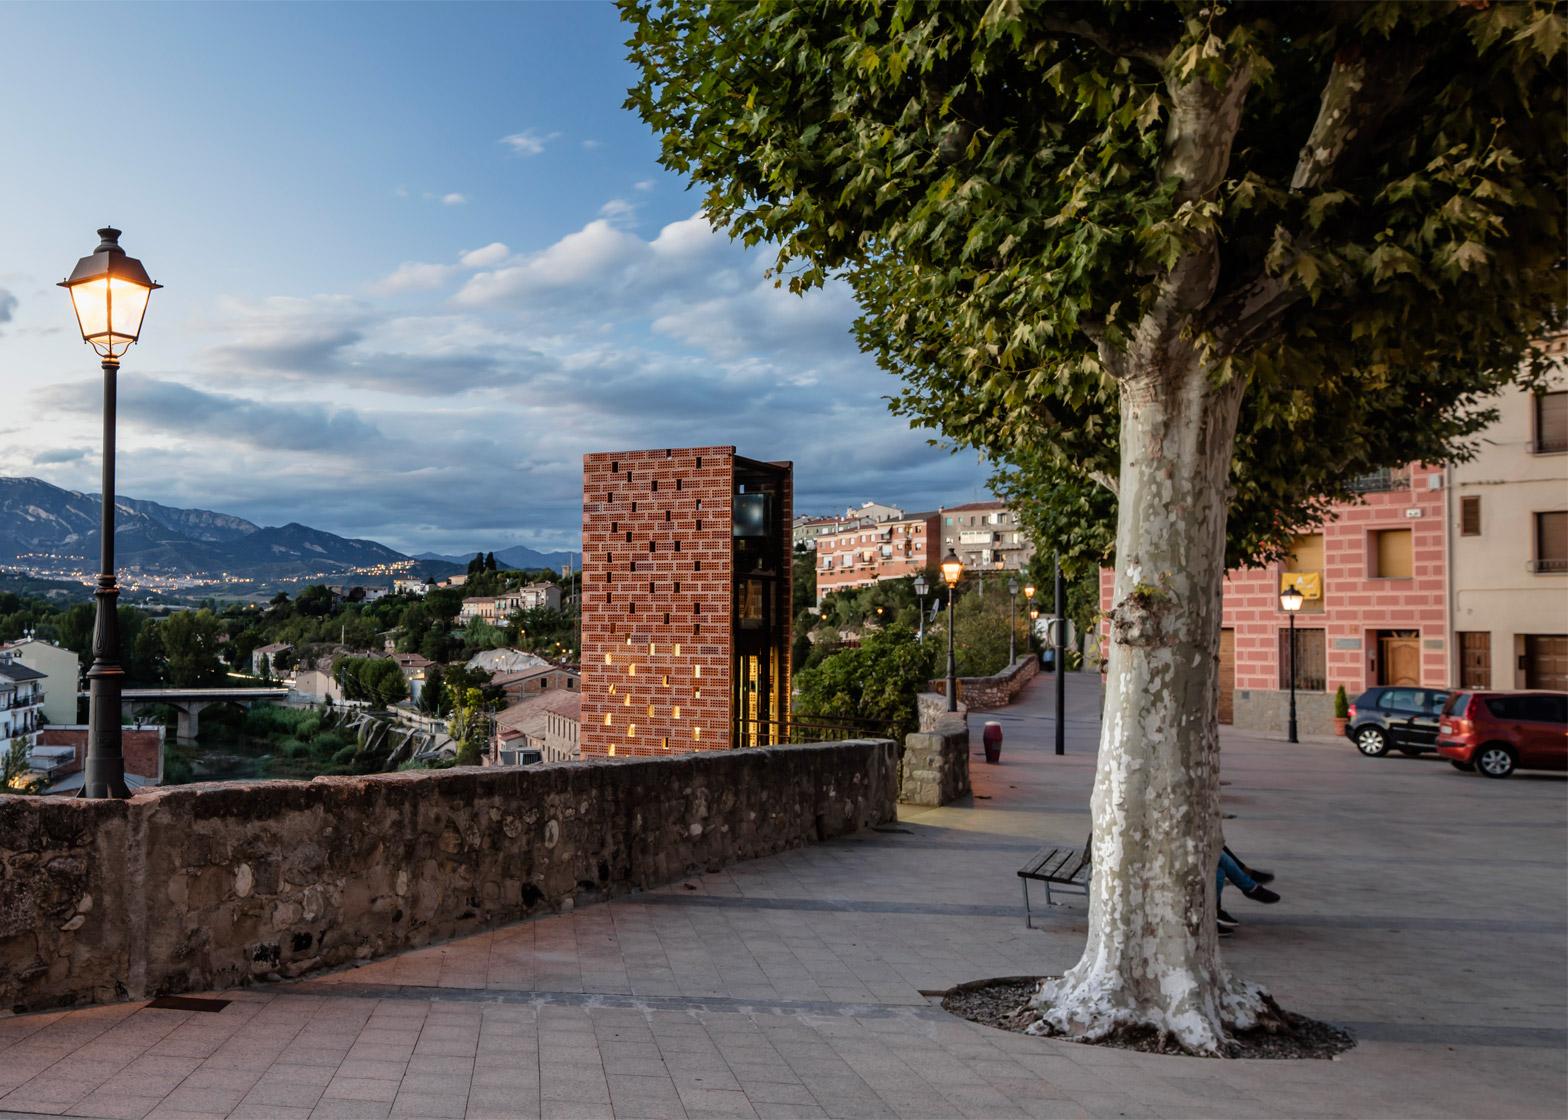 New-Access-to-Gironellas-Historic-Center_Barcelona-Spain_Carles-Enrich_dezeen_1568_7.jpg